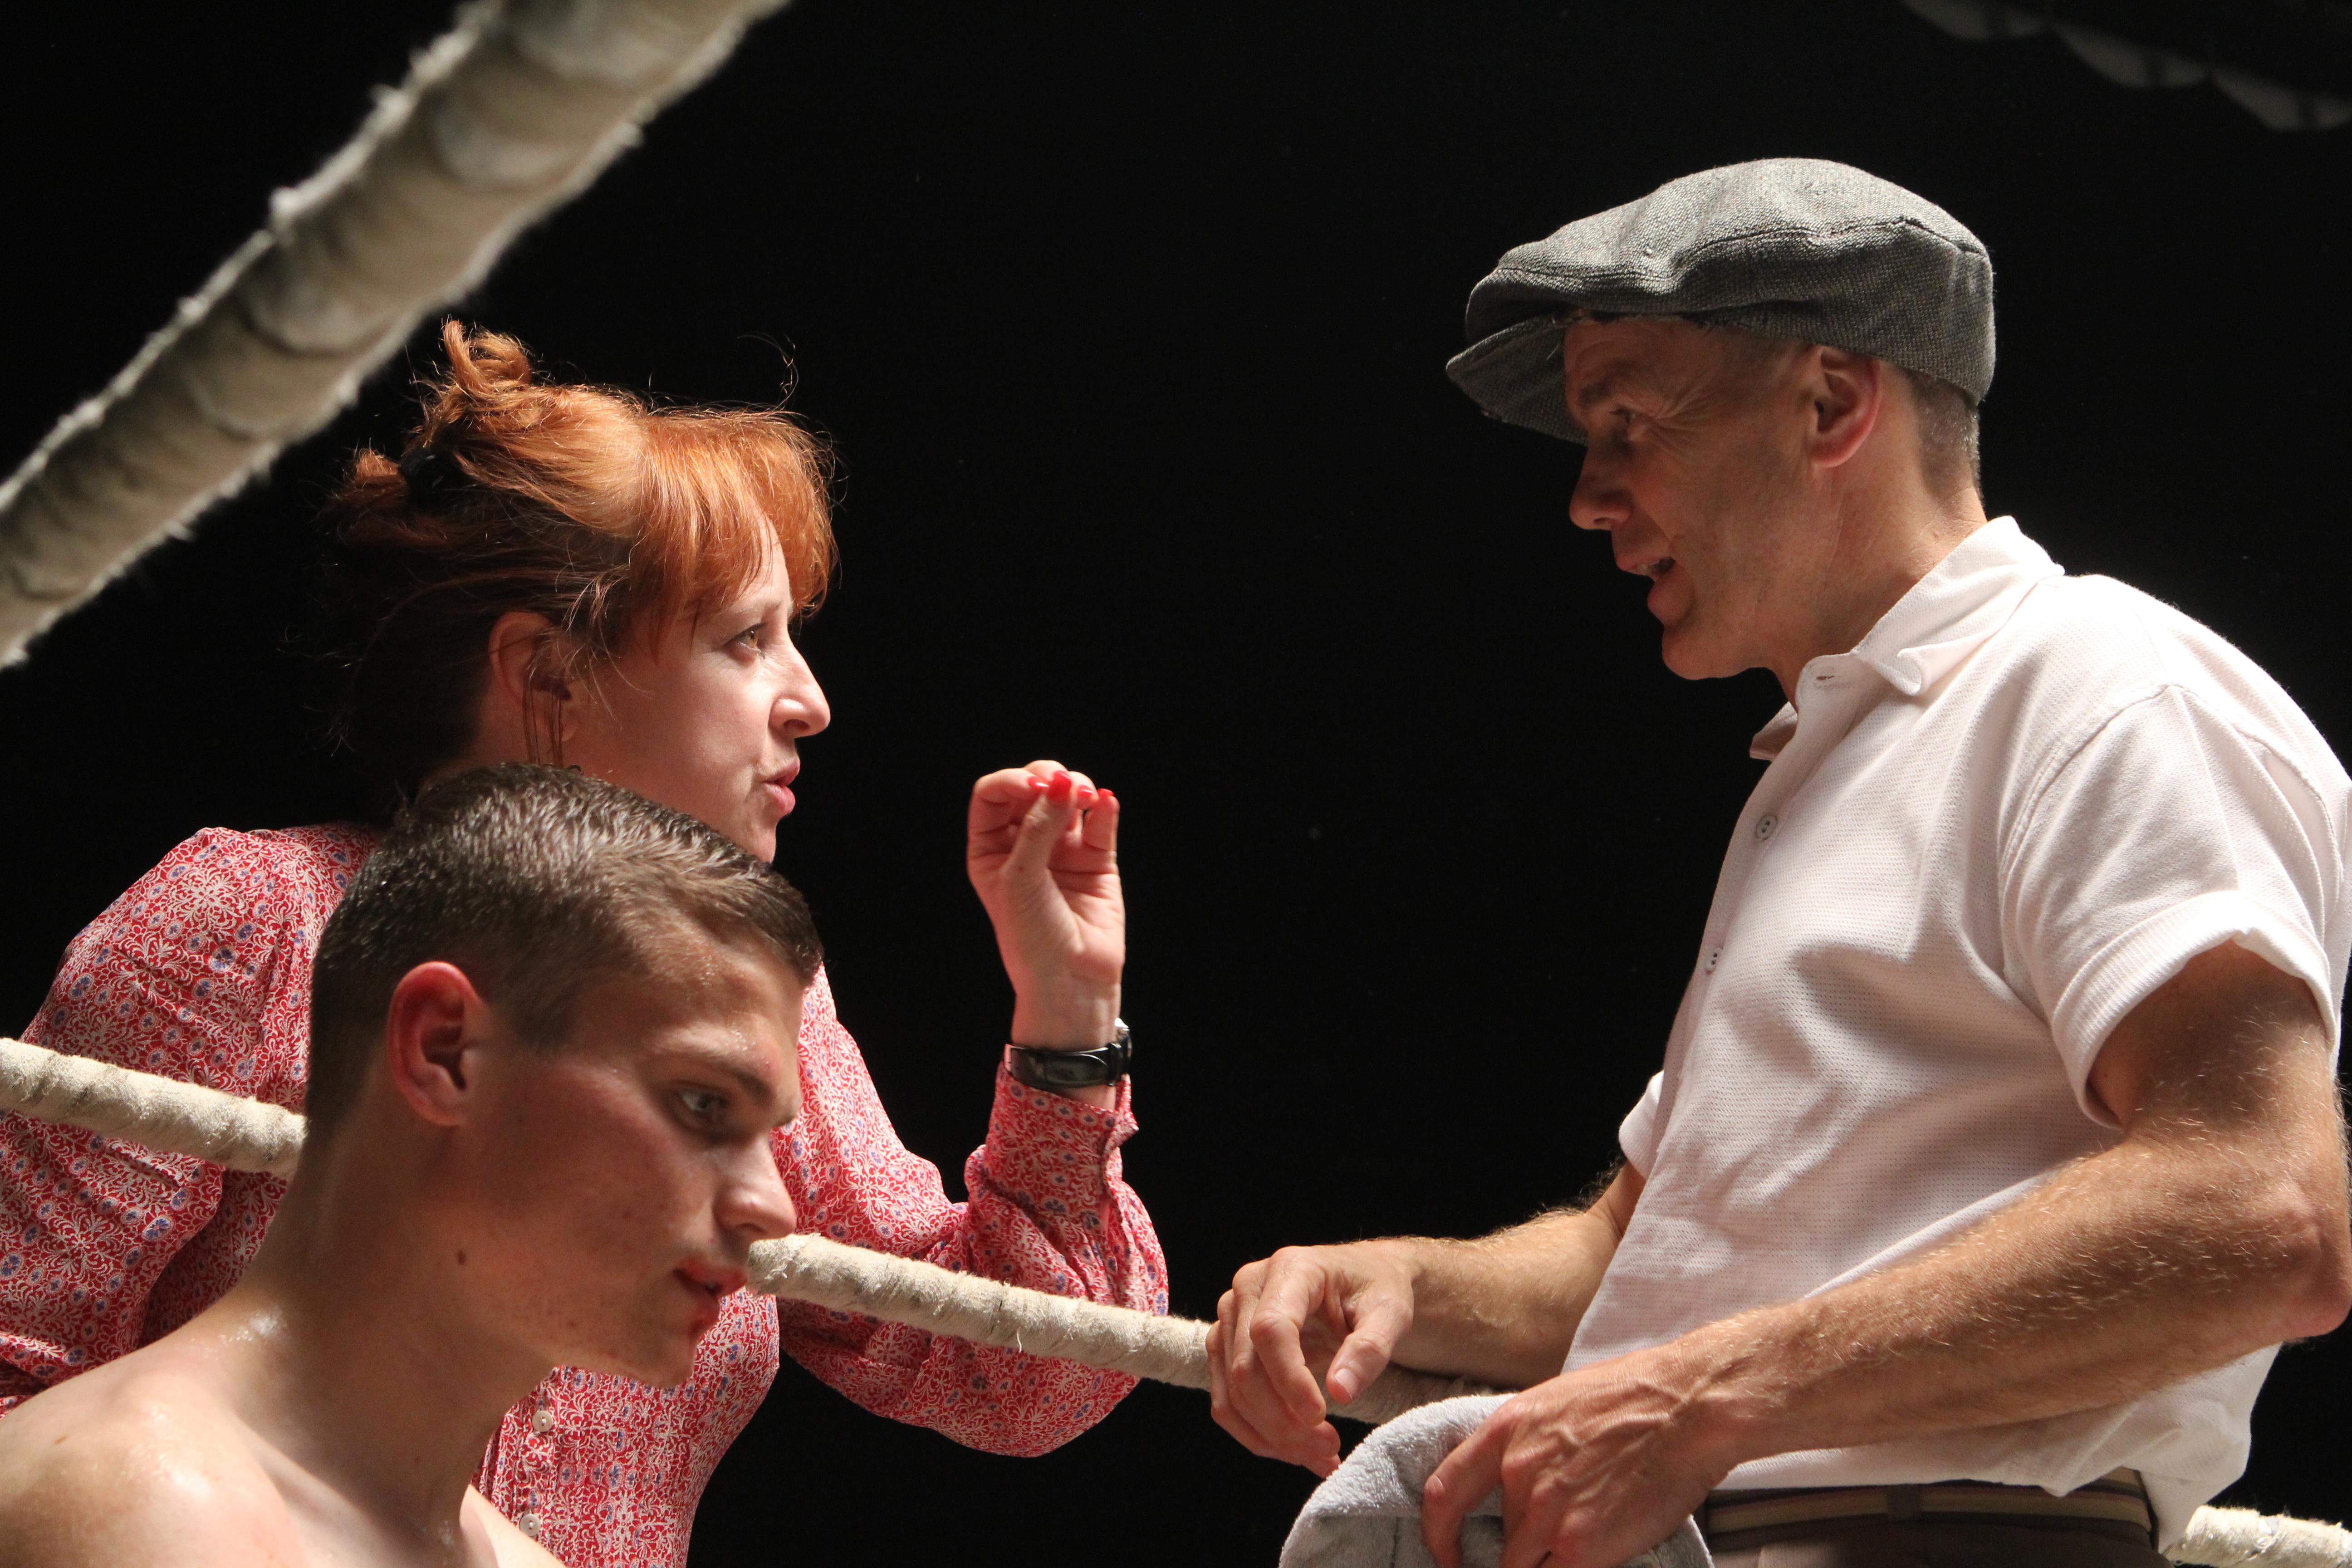 directing Jim MacDonnell